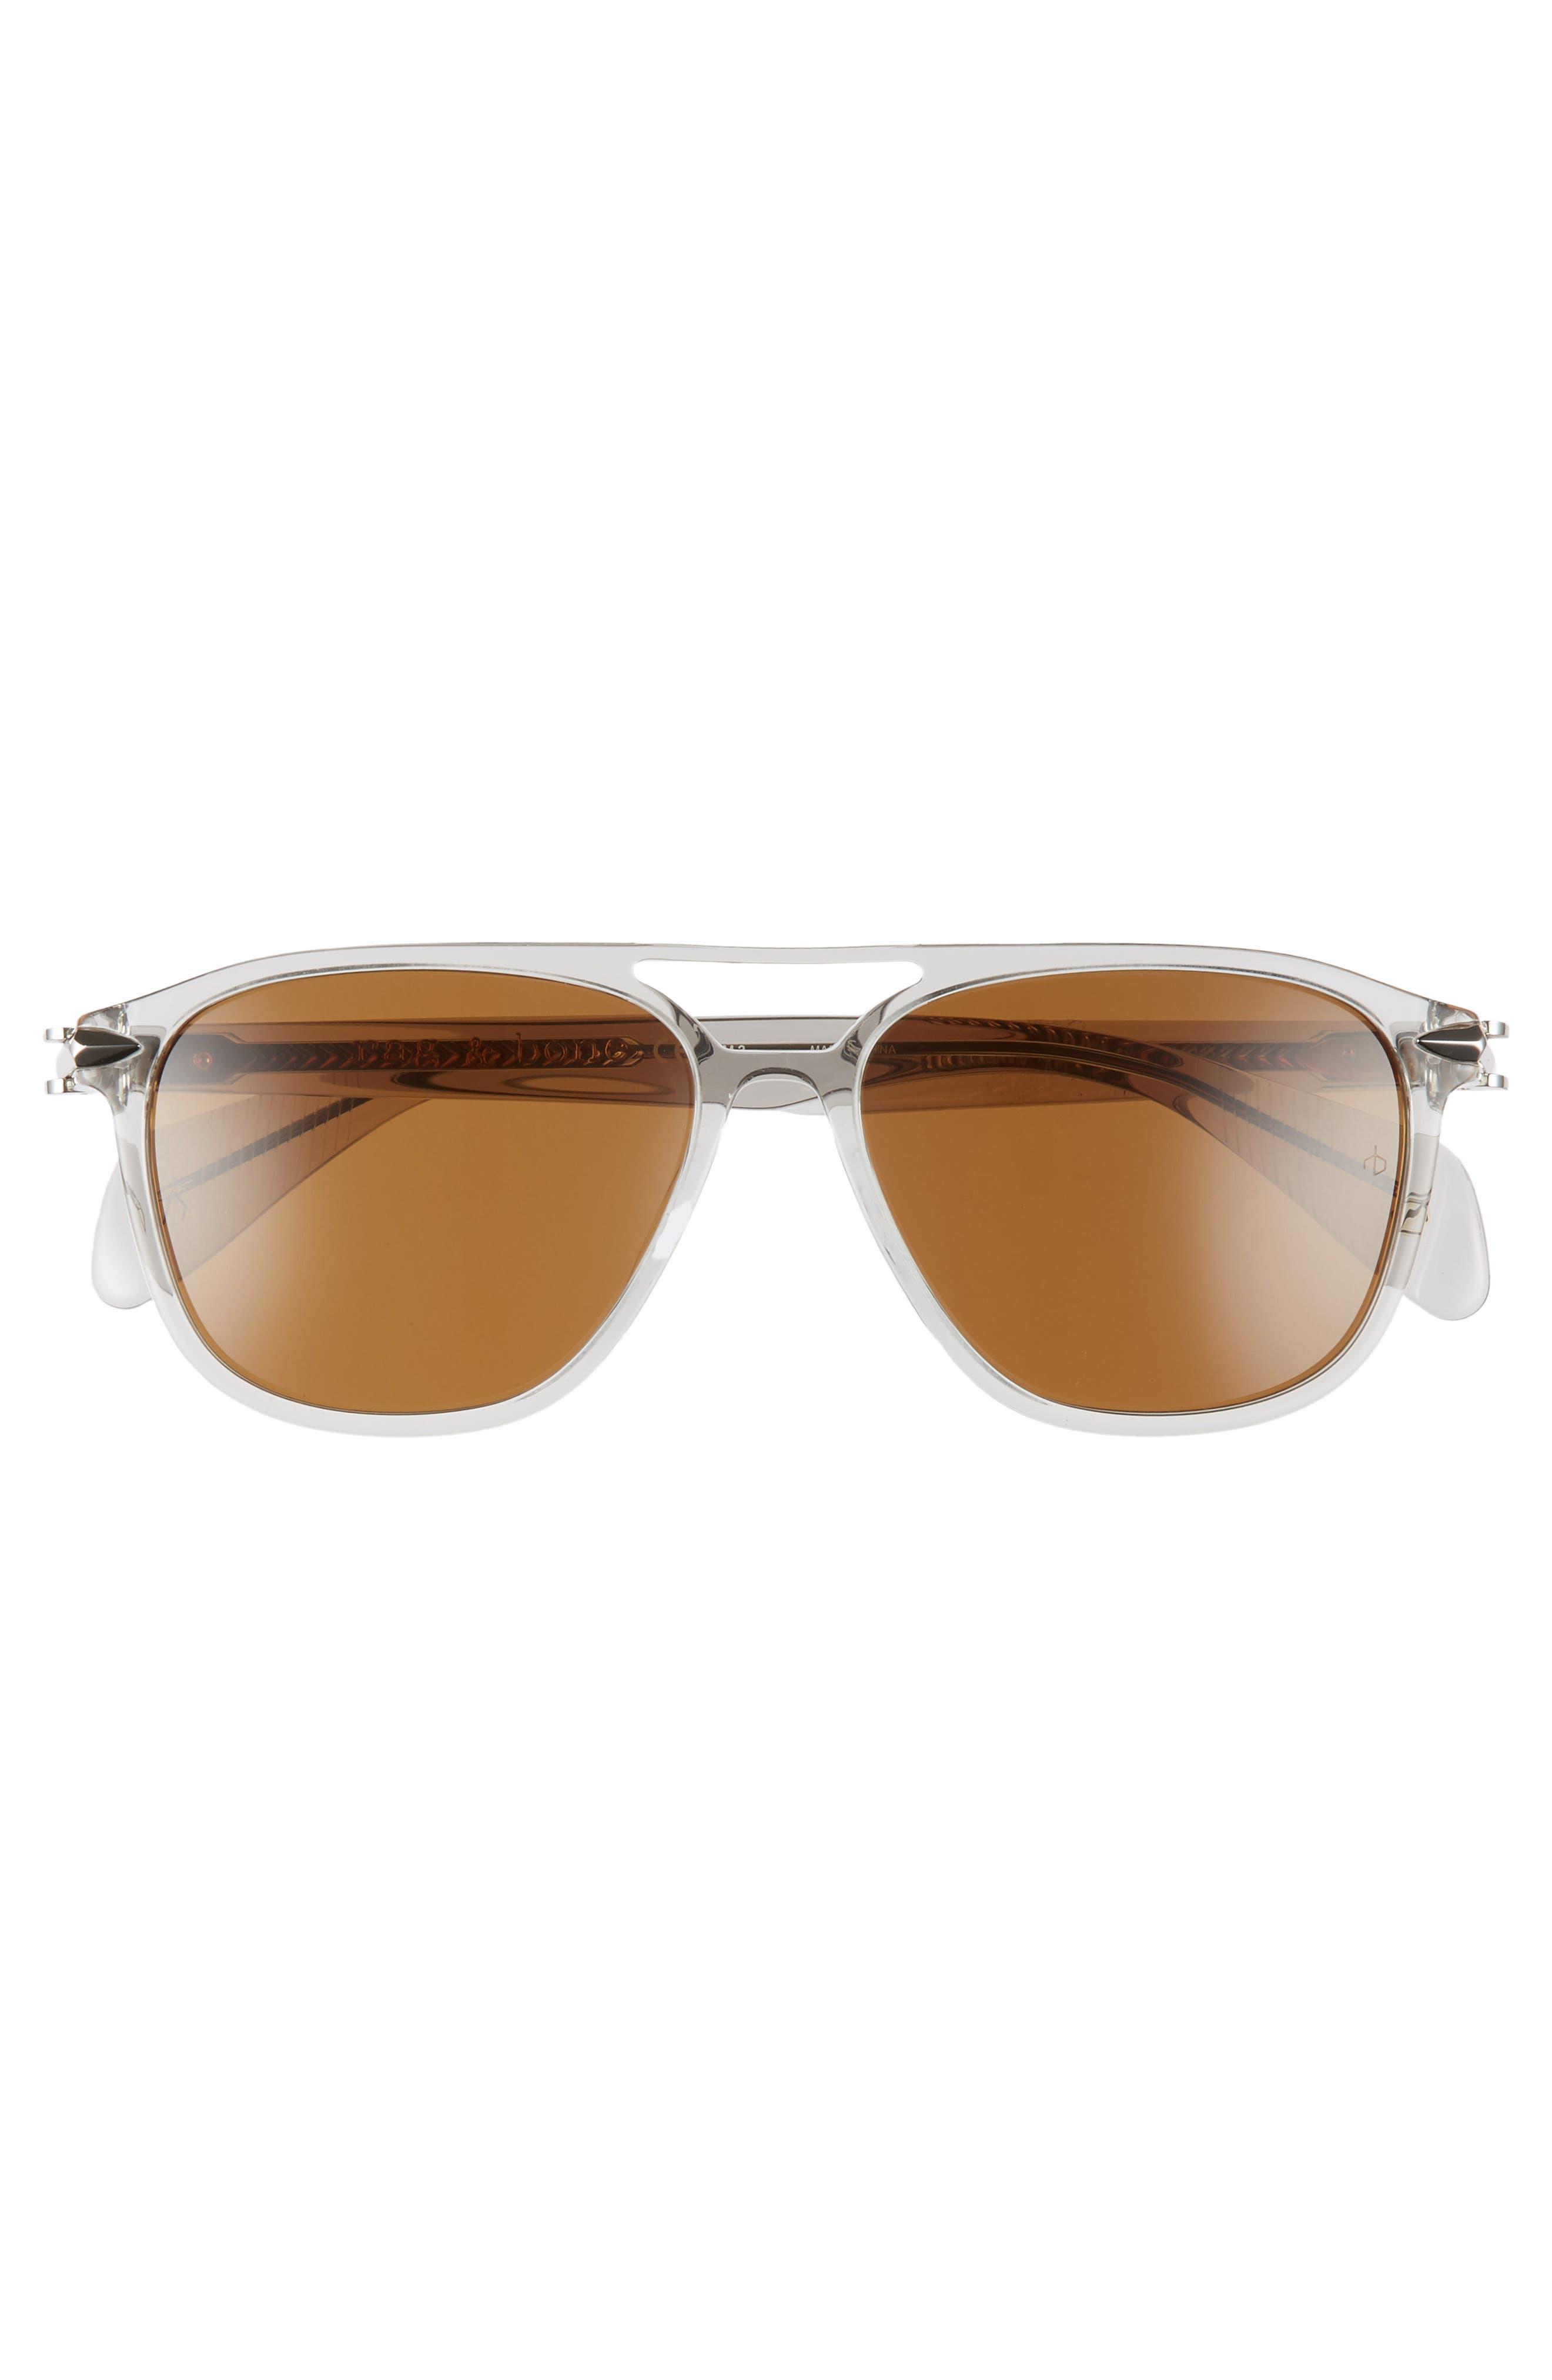 54mm Aviator Sunglasses,                             Alternate thumbnail 3, color,                             GREY